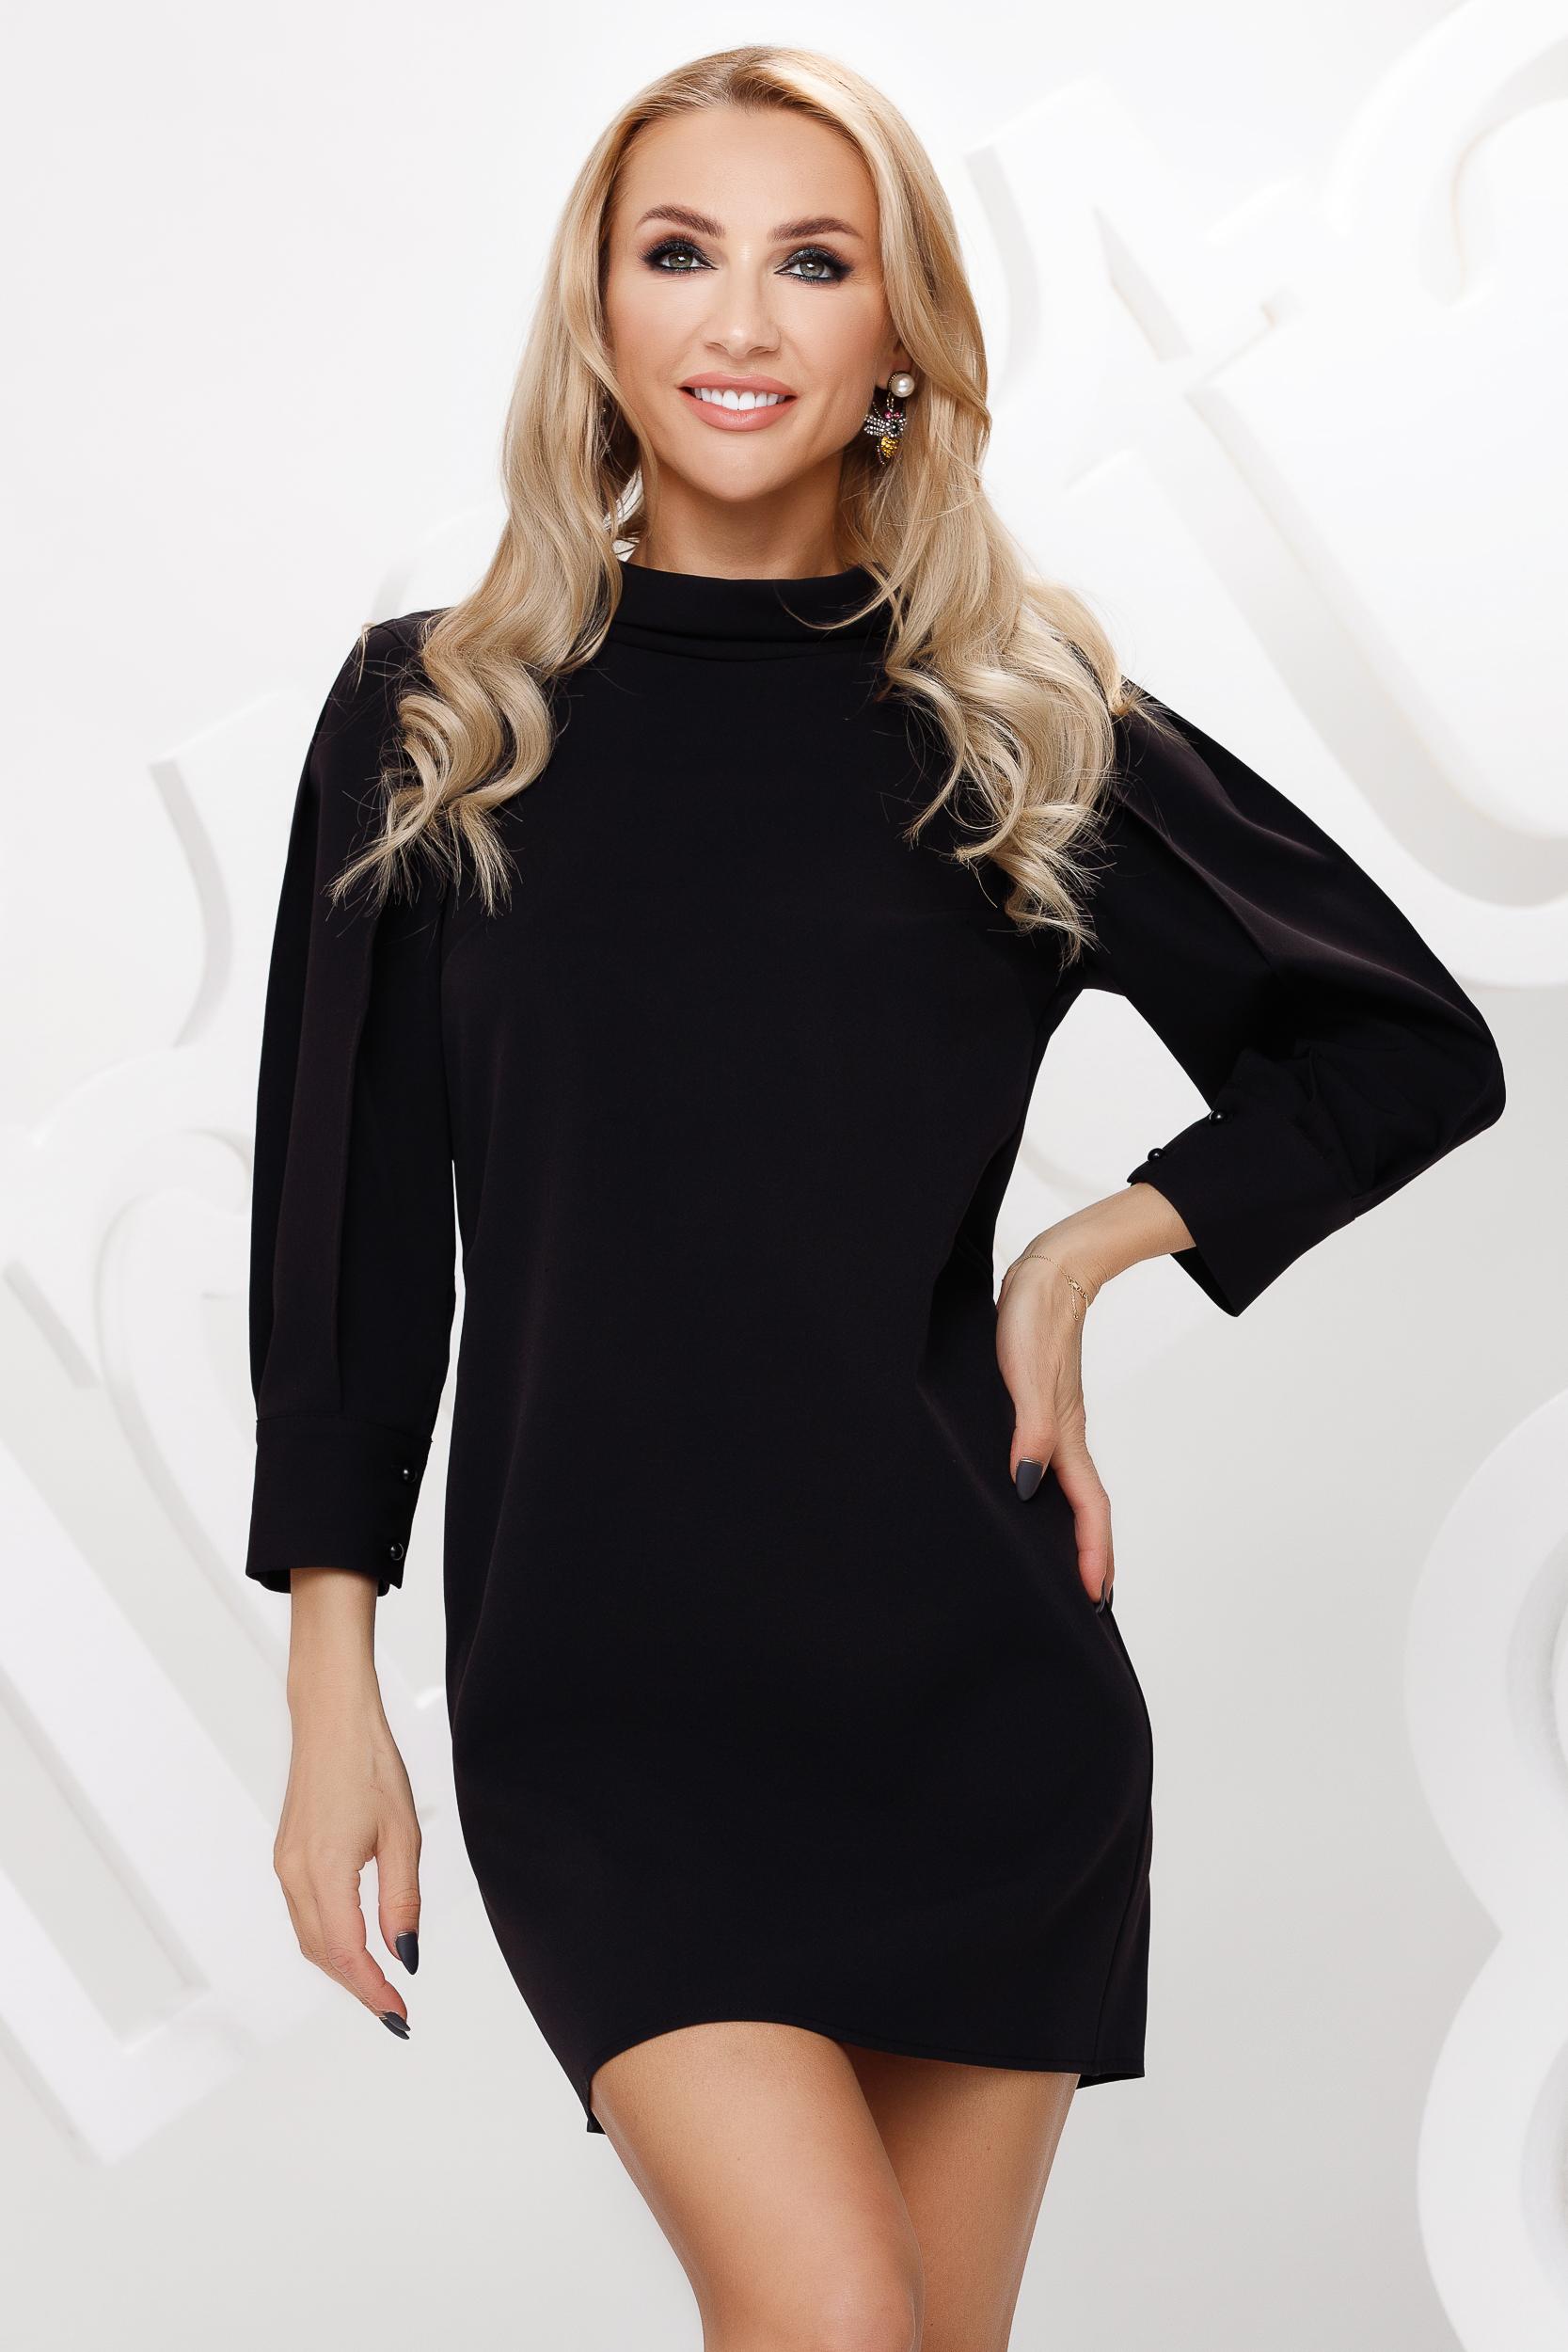 Black dress short cut straight double collar